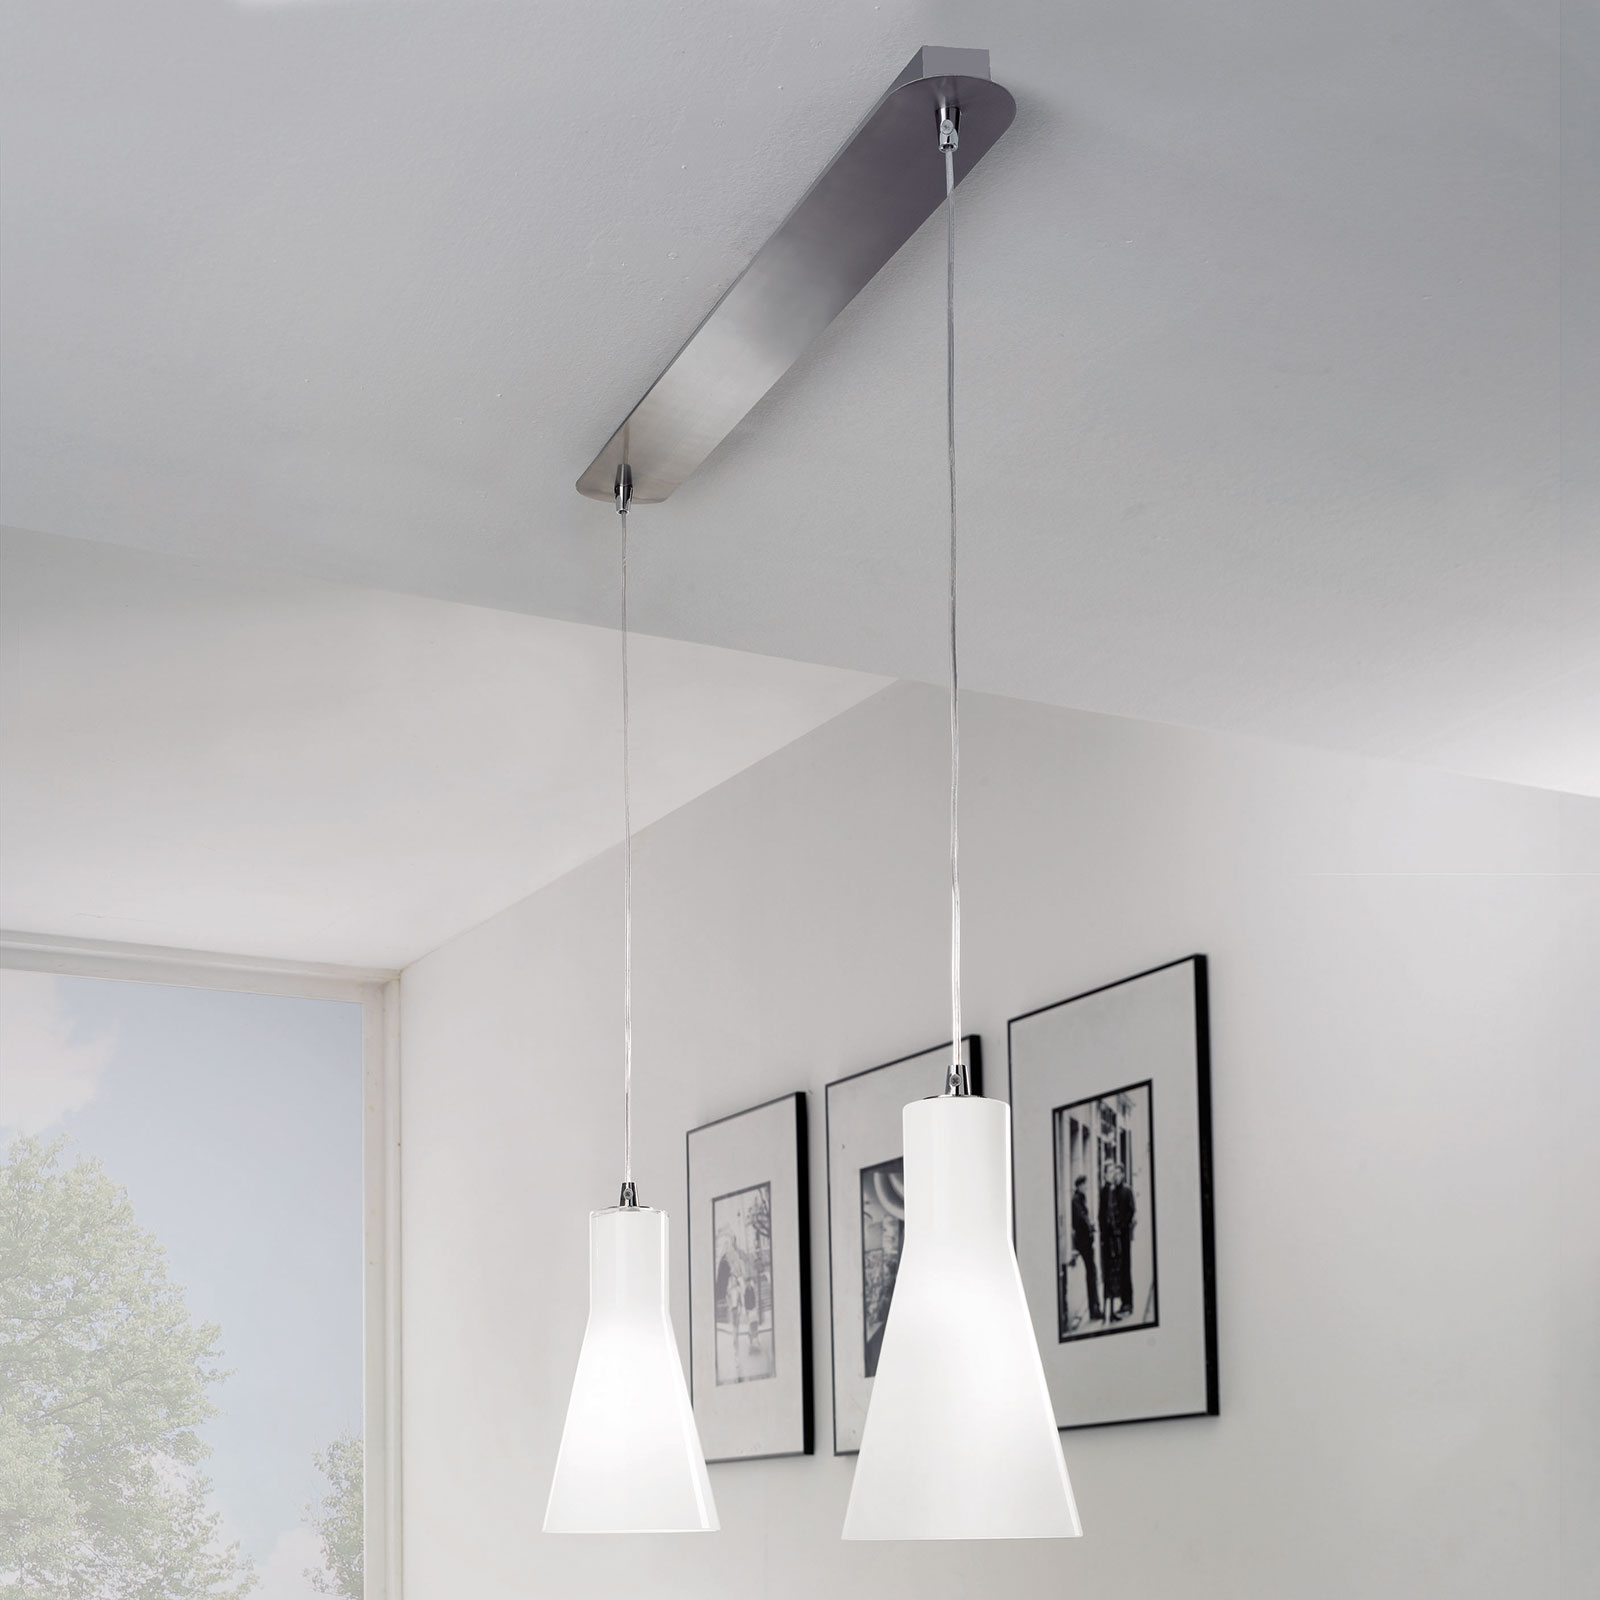 Dana glass hanging light, two-bulb_3501232_1